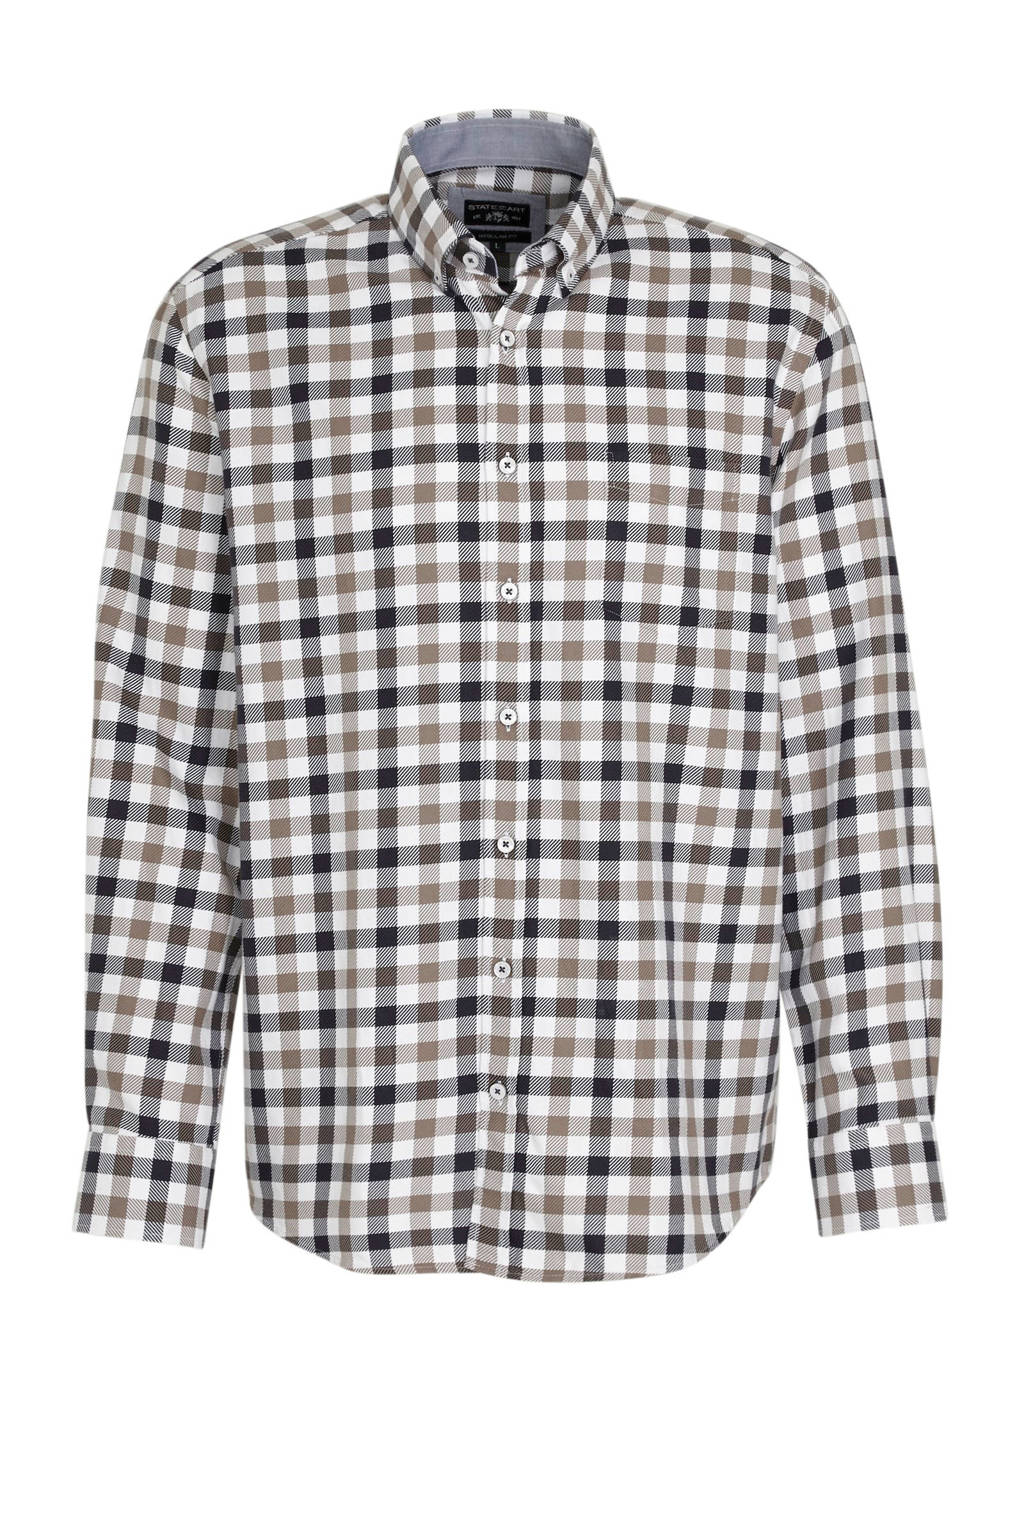 State of Art geruit regular fit overhemd donkerblauw/wit/kaki